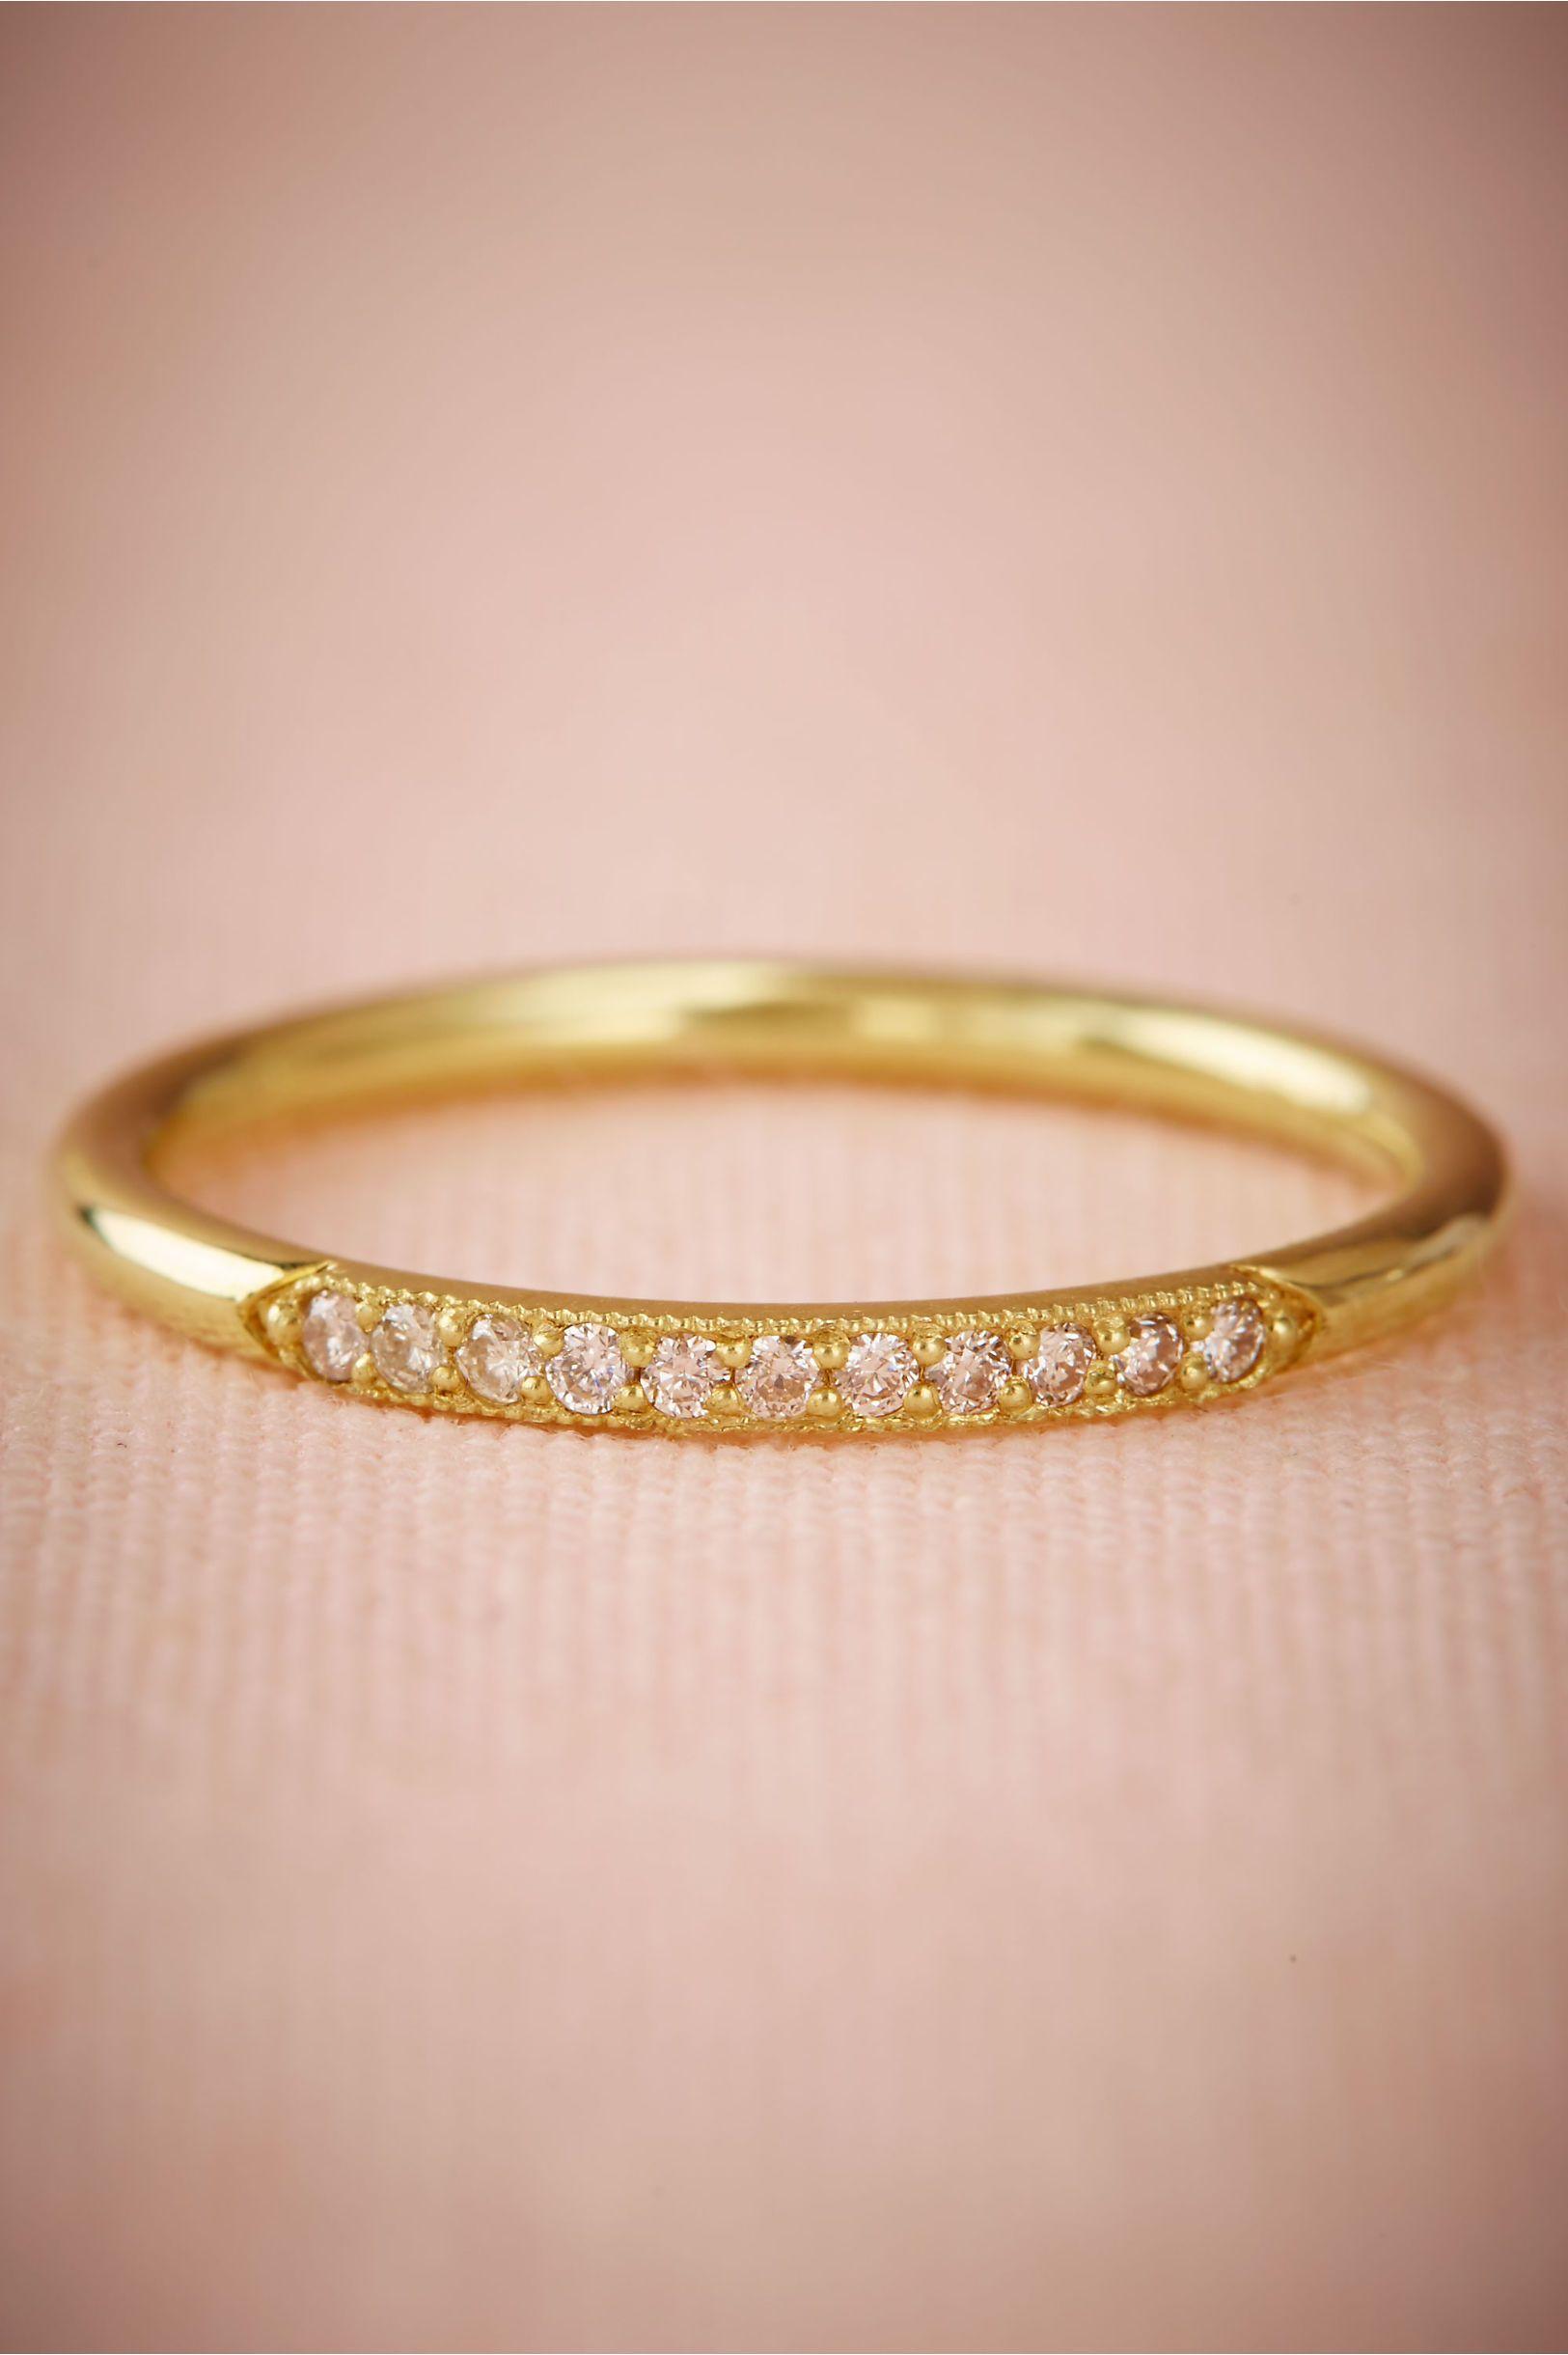 BHLDN\'s Ila Creada Ring in Yellow Gold | Products